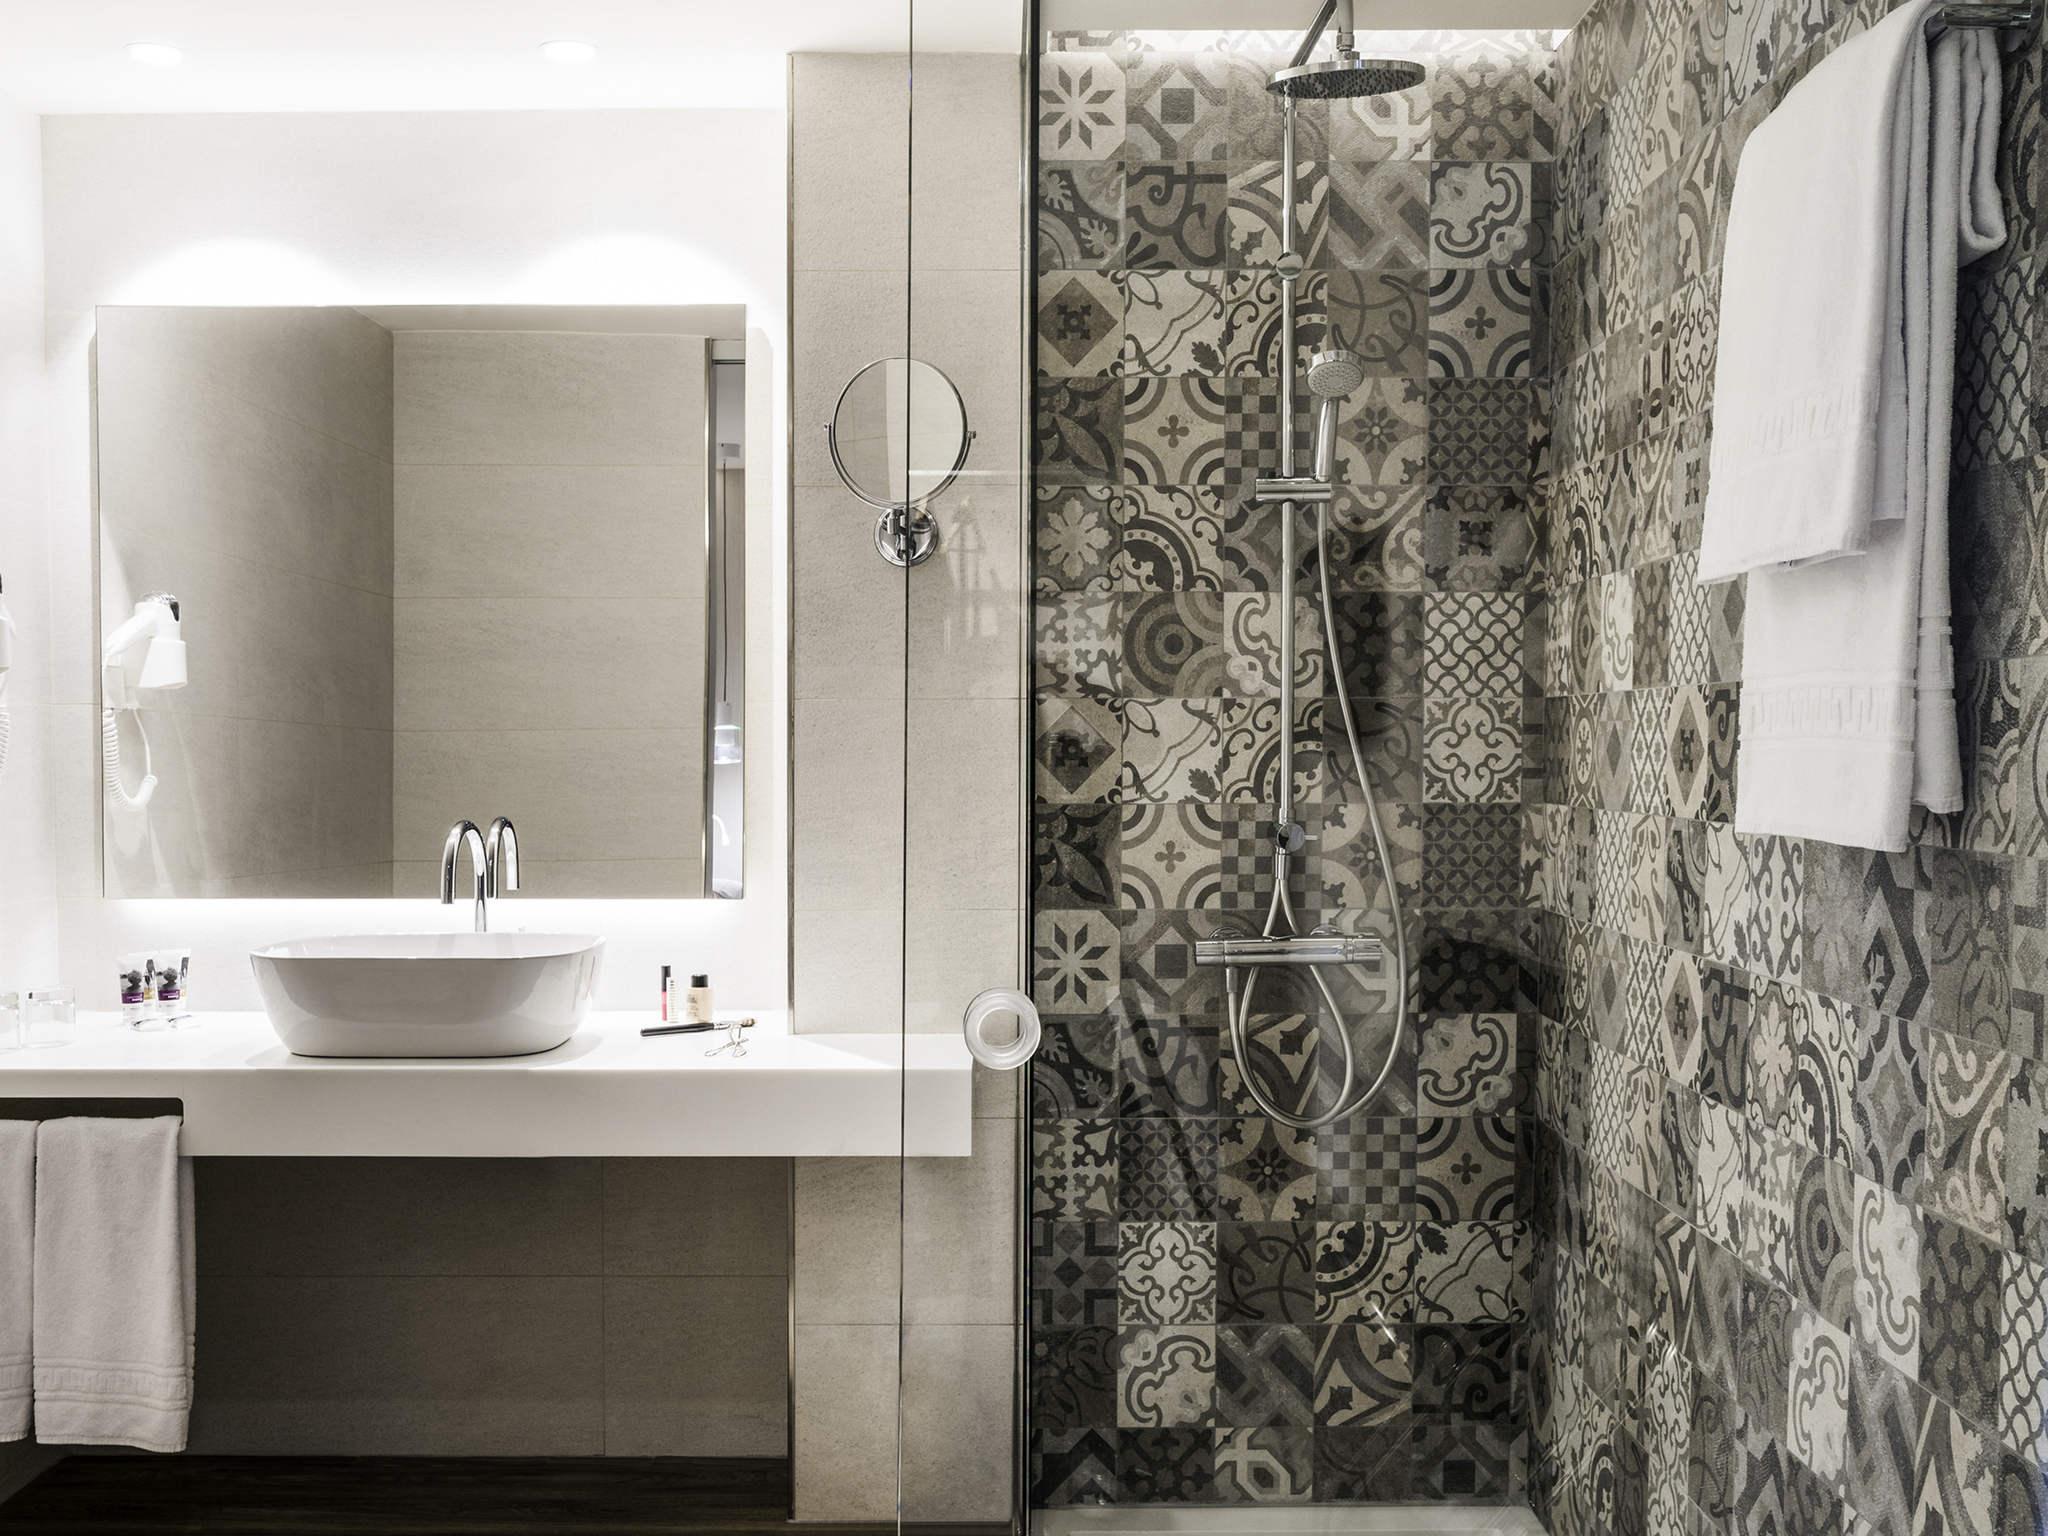 Hotel in BARCELONA - Book your Mercure hotel in Alberta Barcelona